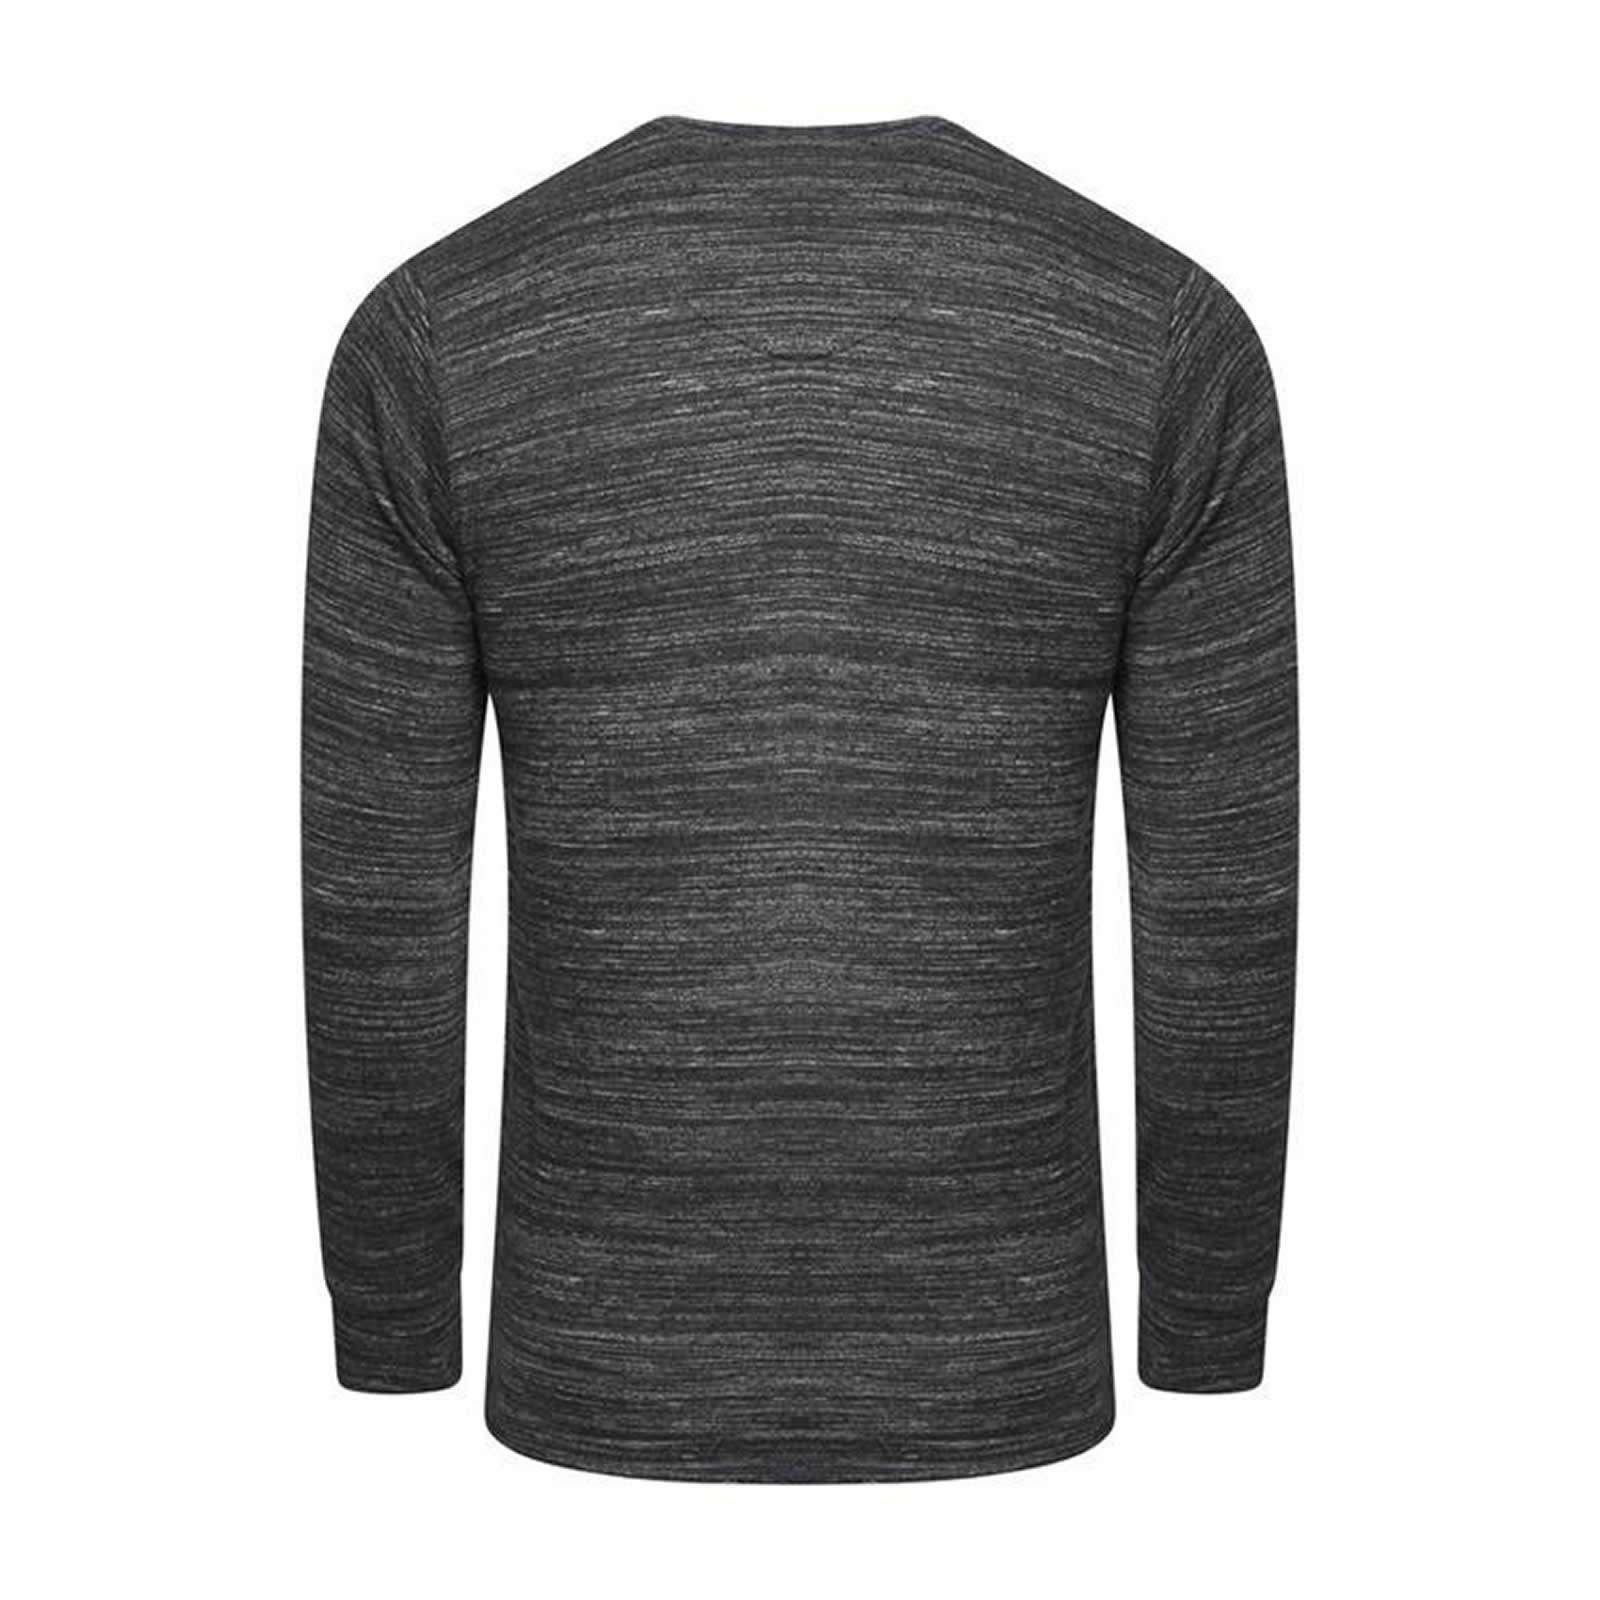 Mens Sweatshirt Jumper Brave Soul Caspian Rose Pullover Sweater